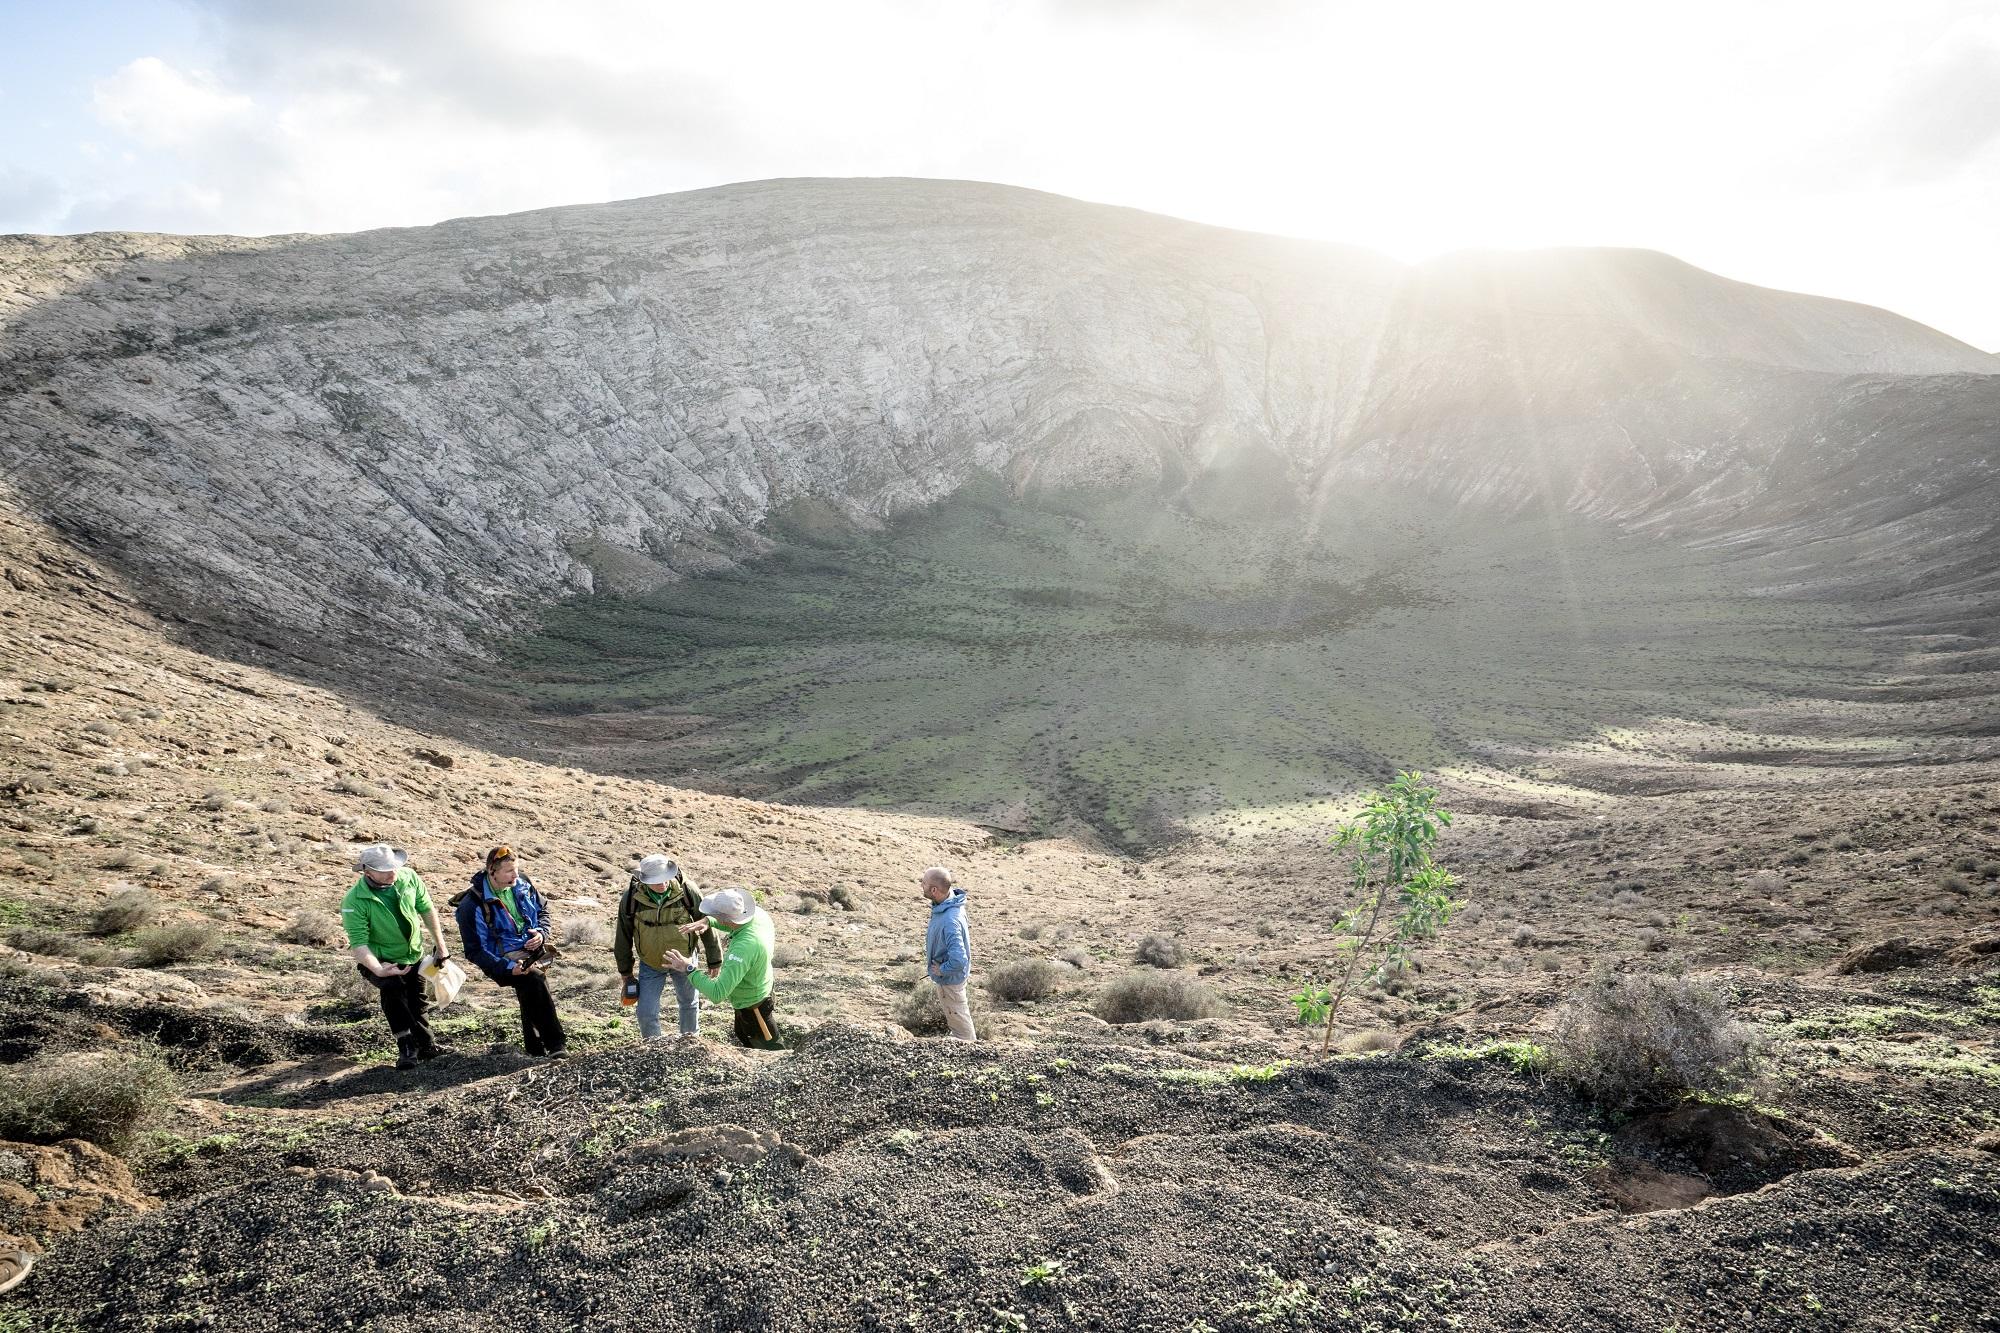 Pangaea 2018 foregikk på Lanzarote, blant annet i et gammelt meteorittkrater. Foto: ESA/A. Romeo